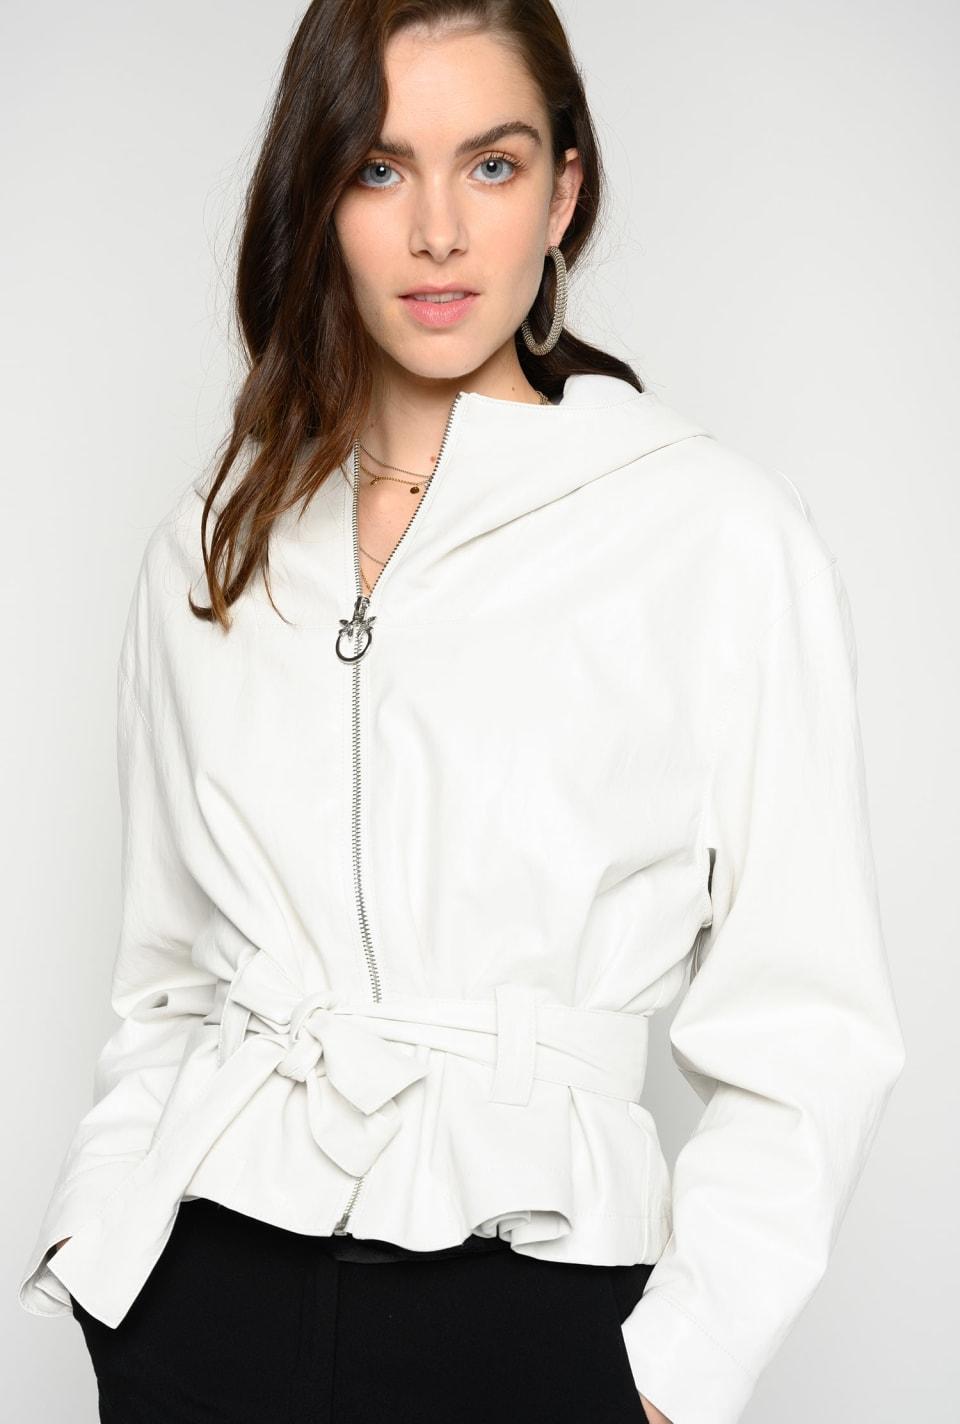 Jacke aus Stoff in Lederoptik - Pinko